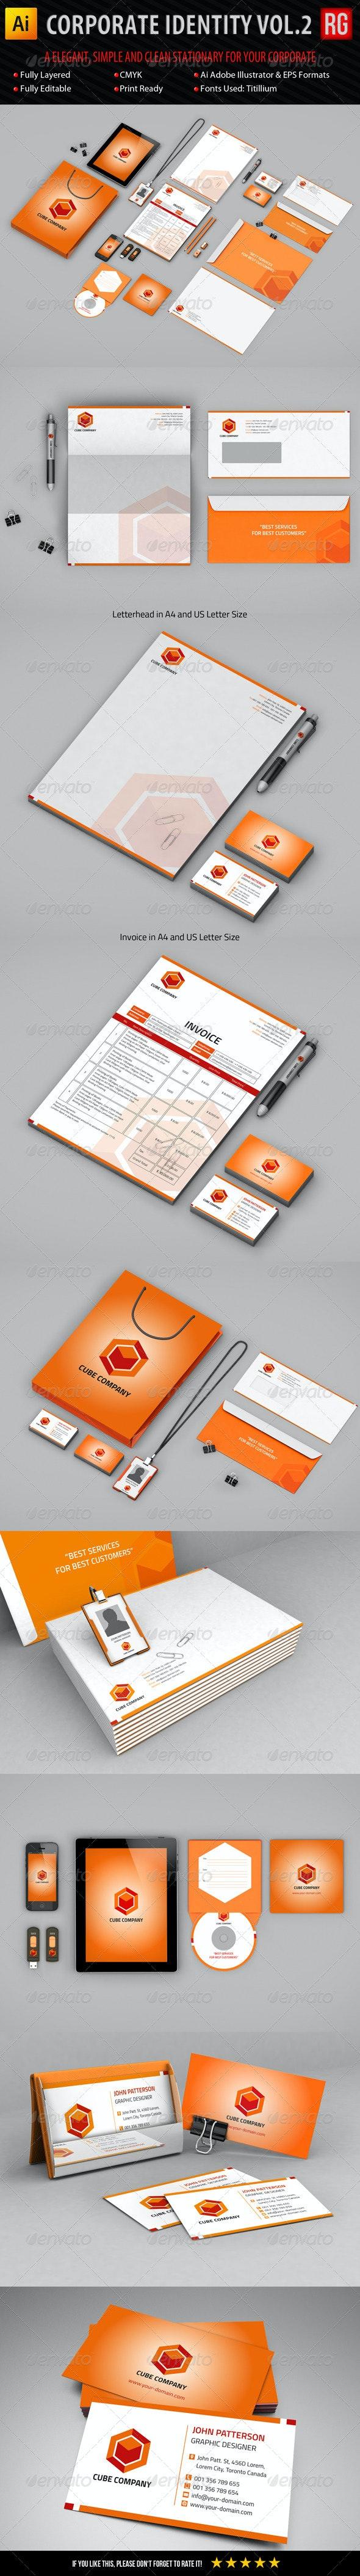 Corporate Identity Vol.2 - Stationery Print Templates